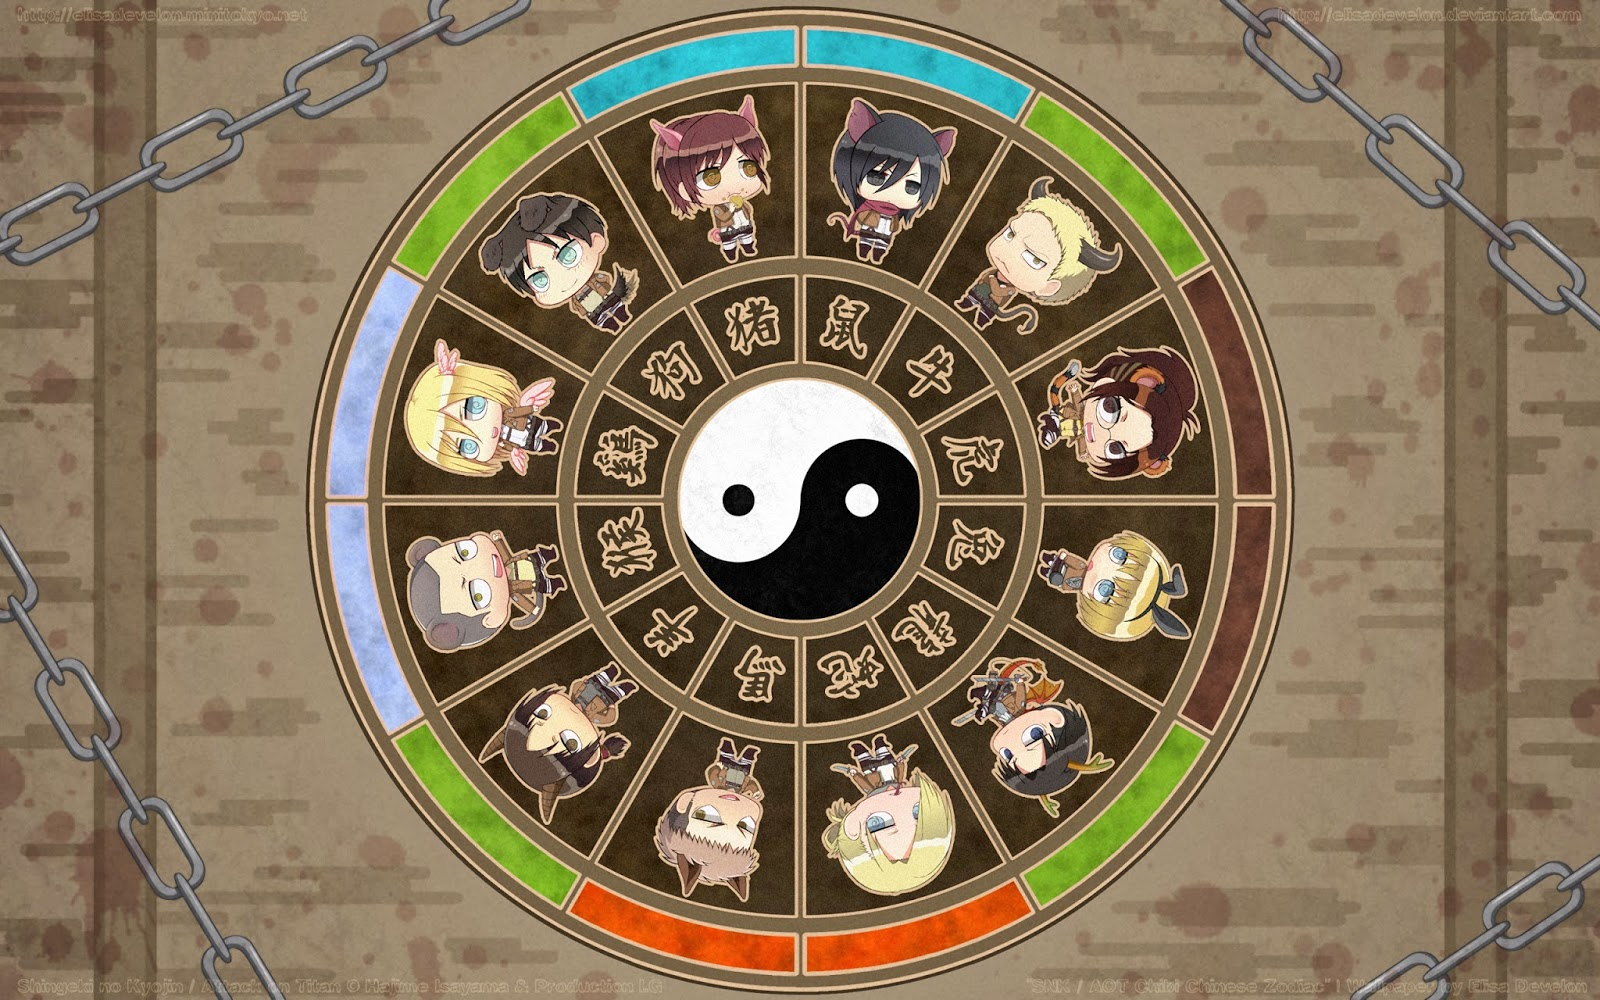 Shingeki no Kyojin Chinese Zodiac